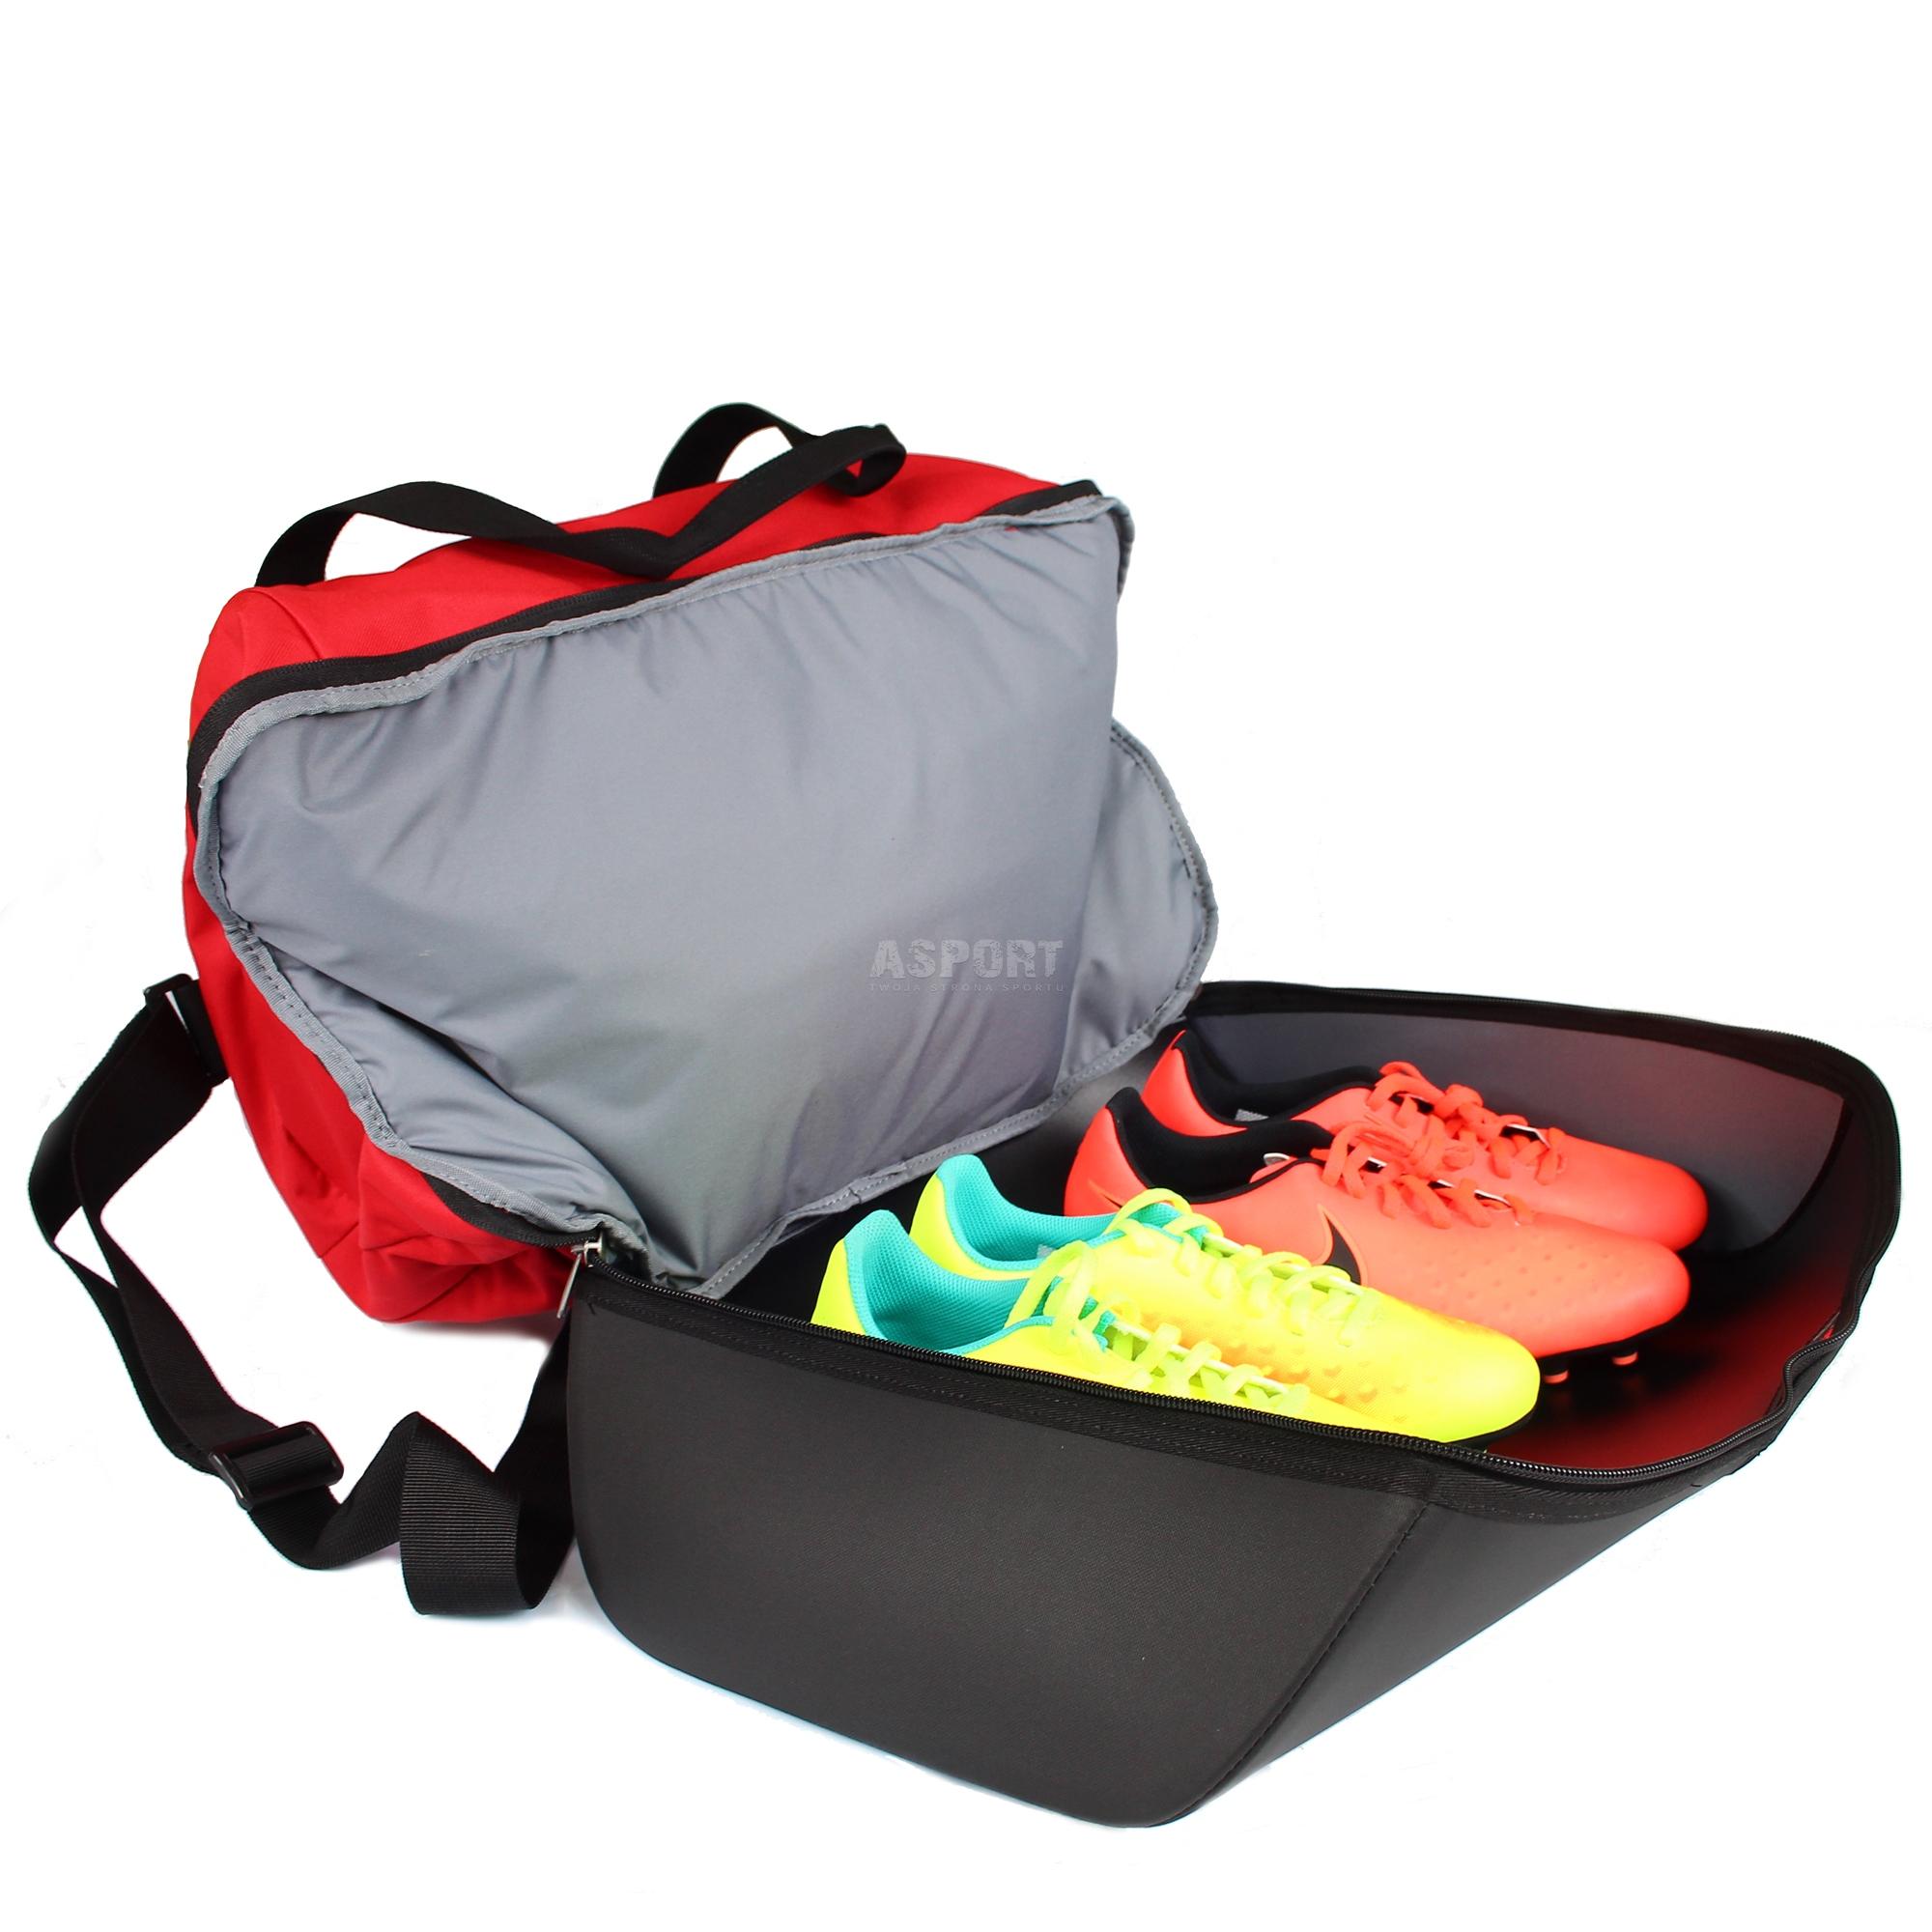 c3049d4777ec8 Torba sportowa, piłkarska CLUB TEAM SWSH HRDCS M 45l czerwona Nike ...